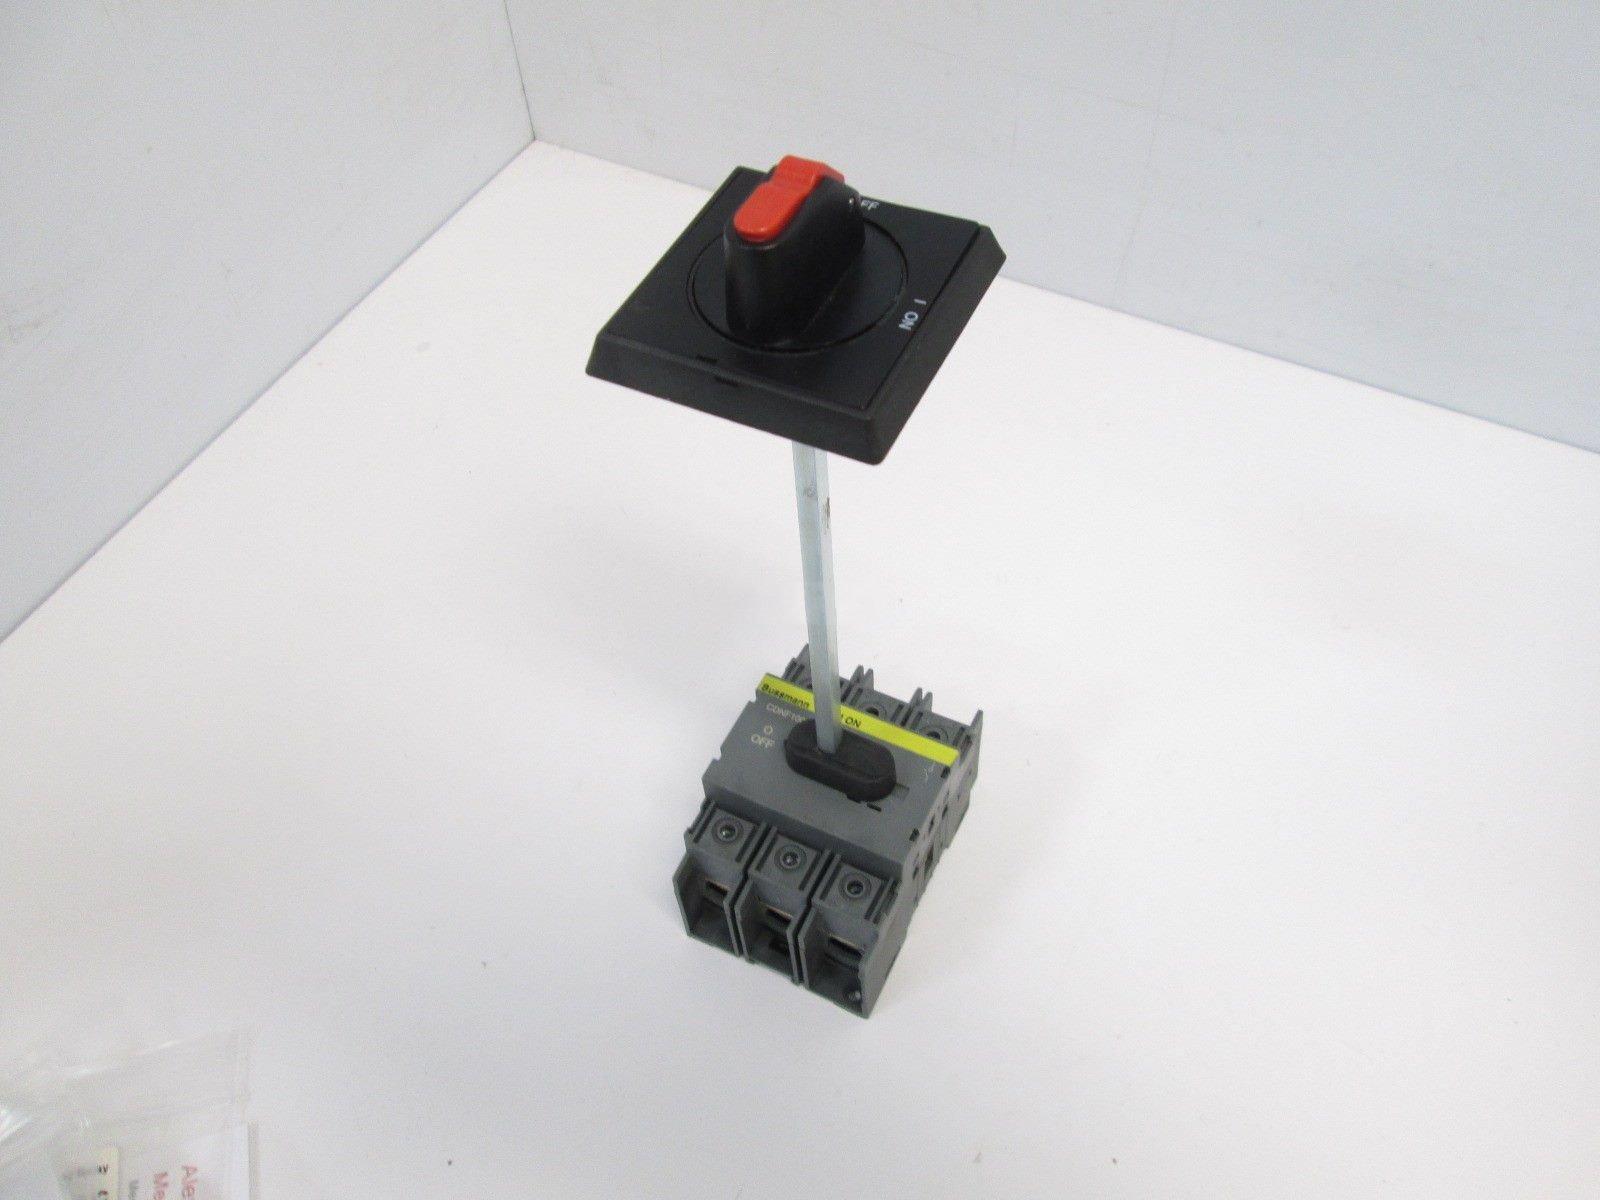 Bussmann CDNF100A3 Disconnect Switch, 3 Pole, 600V 100A 3PH